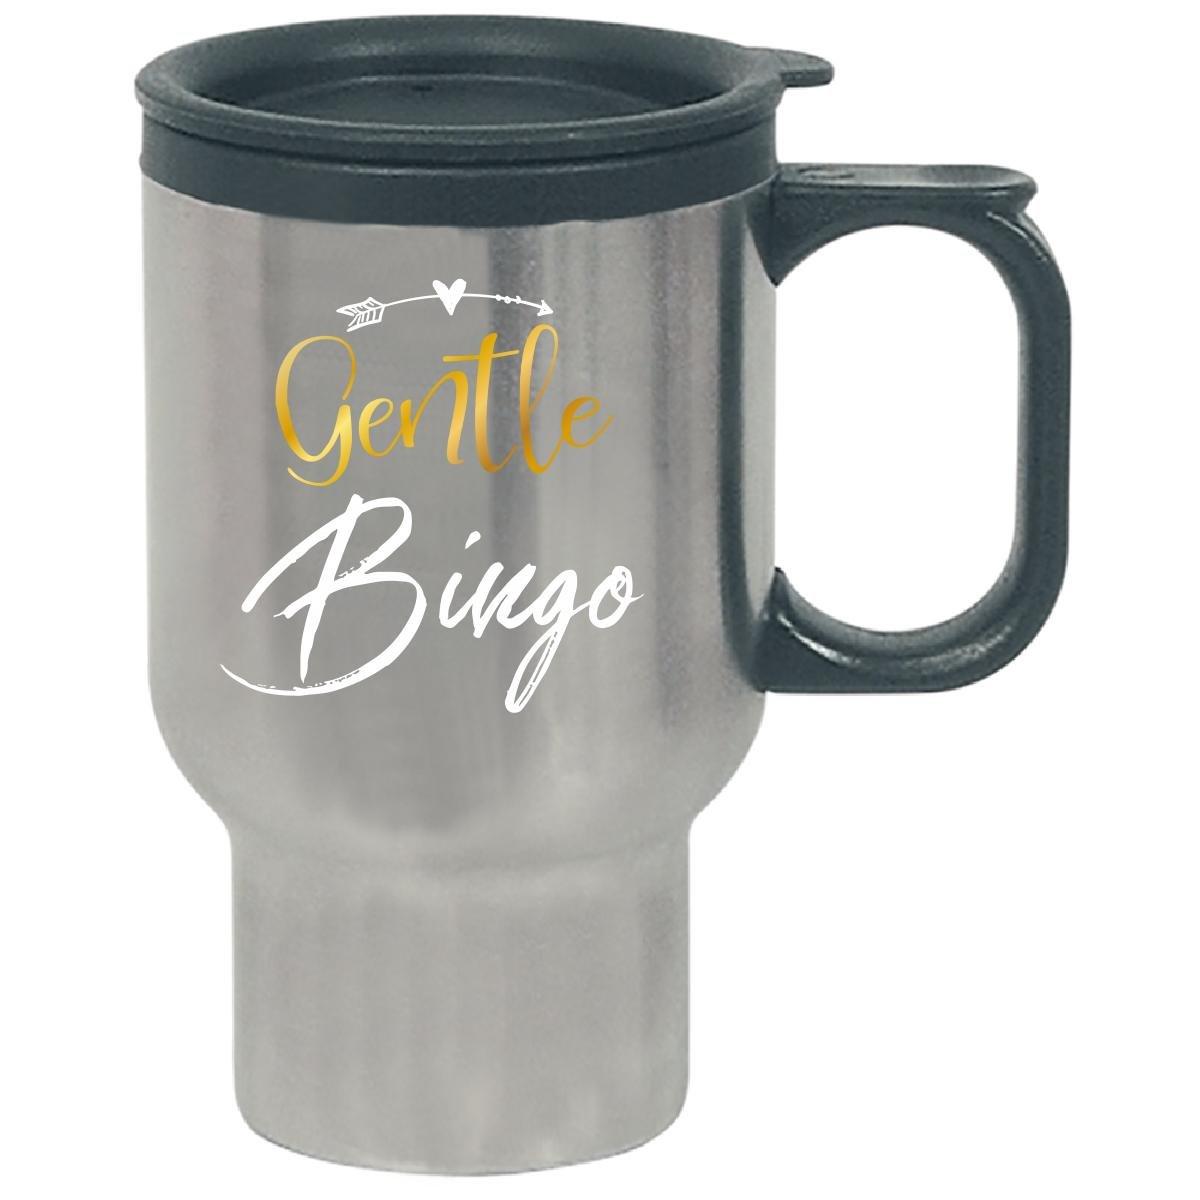 Gentle Bingo Name Gift Mothers Day Present Grandma - Travel Mug by My Family Tee